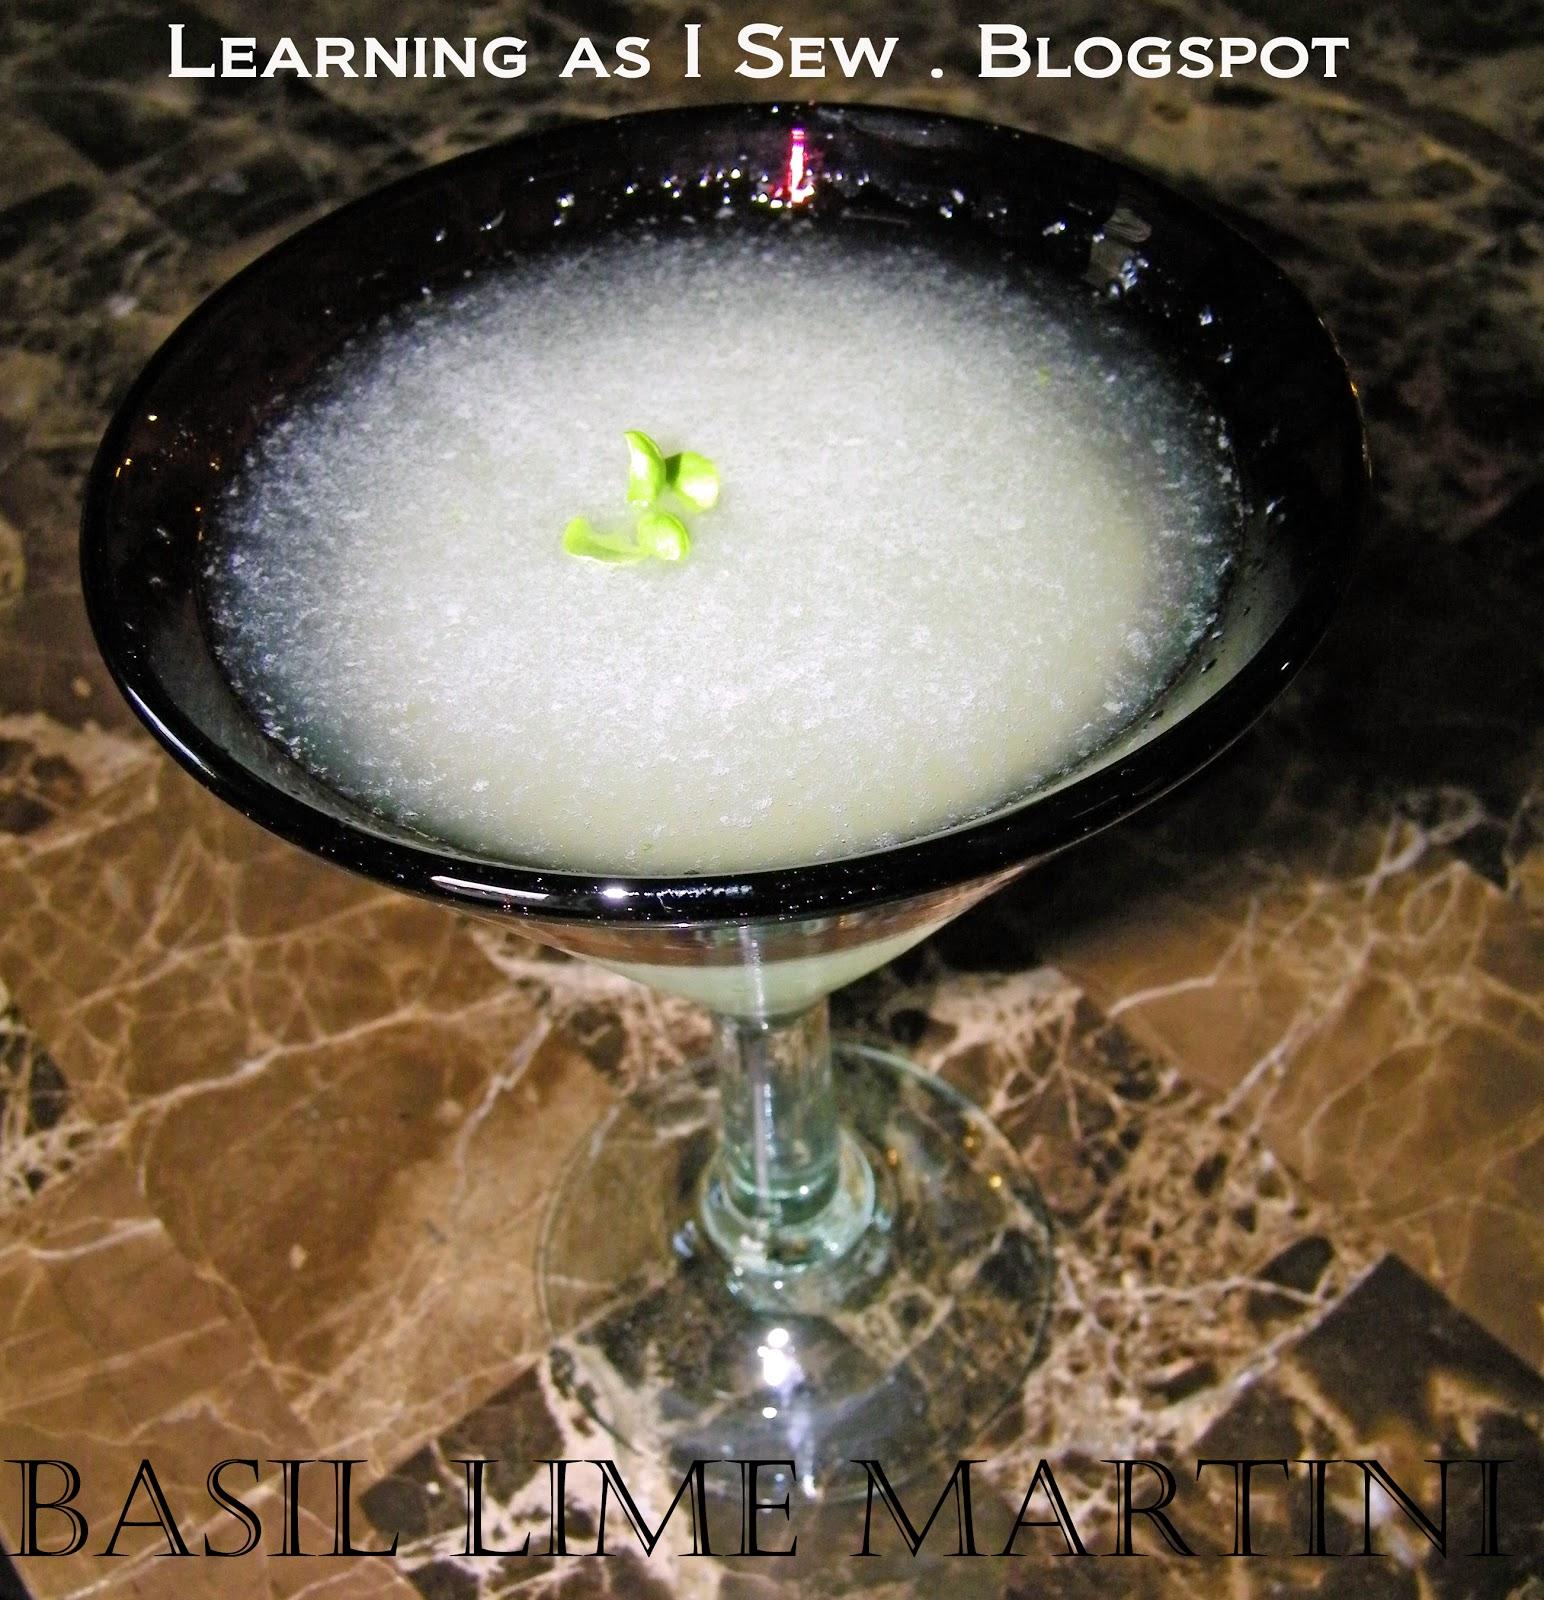 Basil-Lime Martini